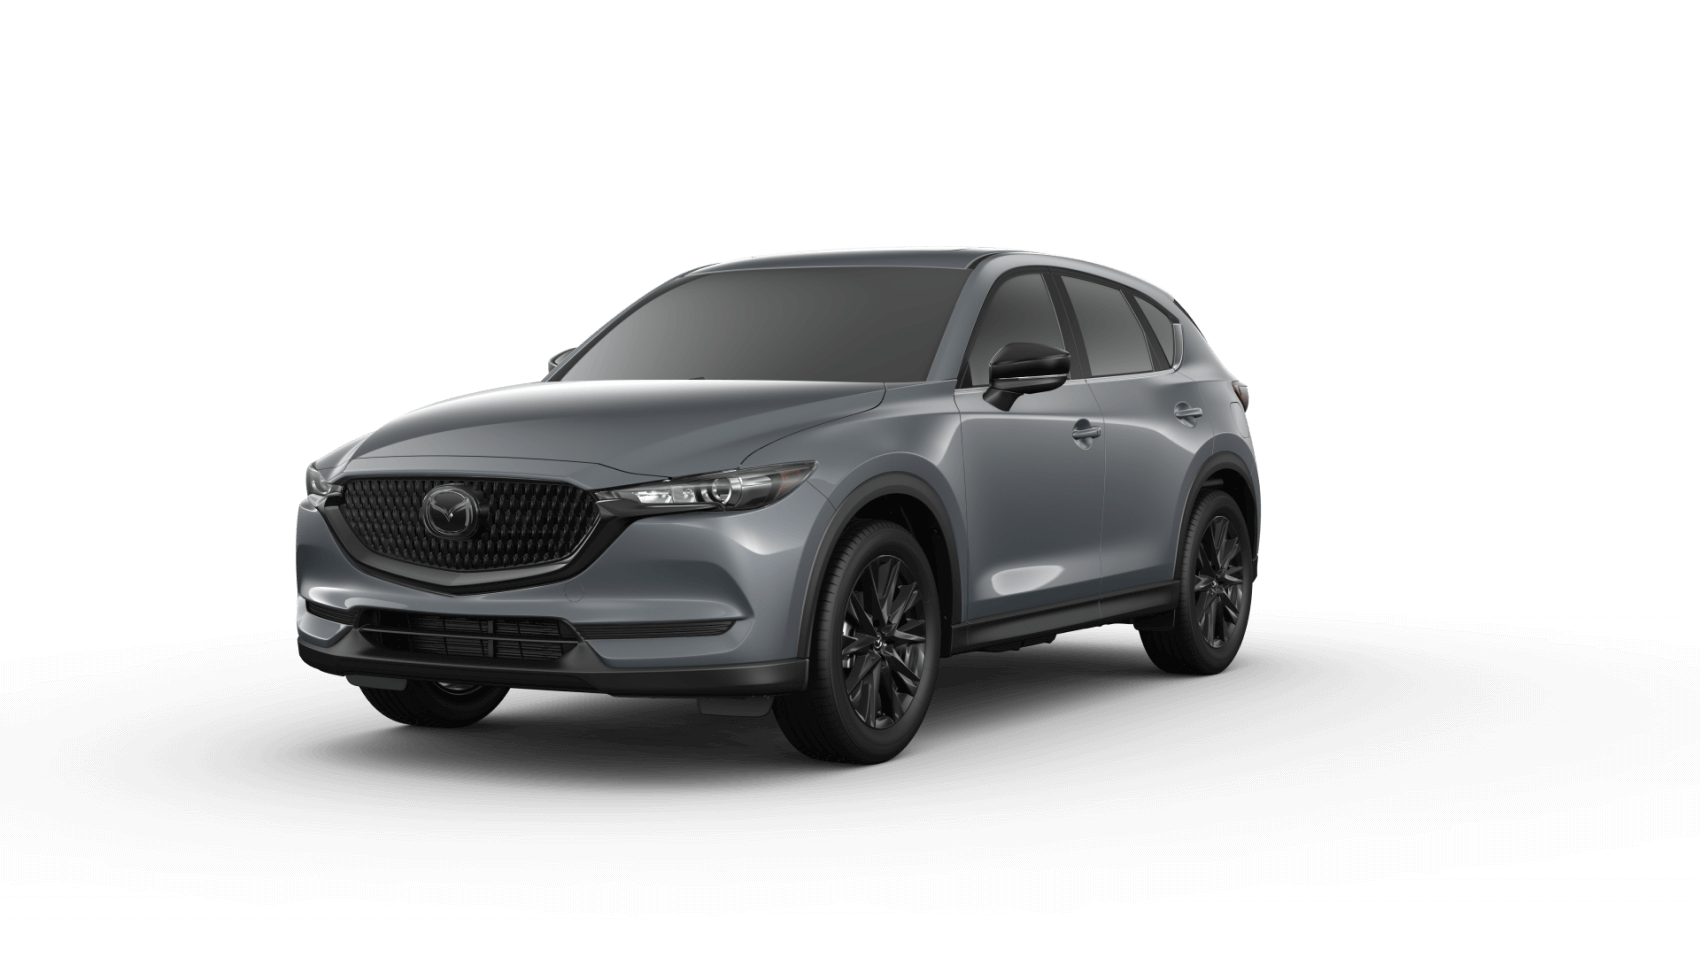 2021 Mazda CX-5 Carbon Edition Turbo Polymetal Gray Ocean Mazda